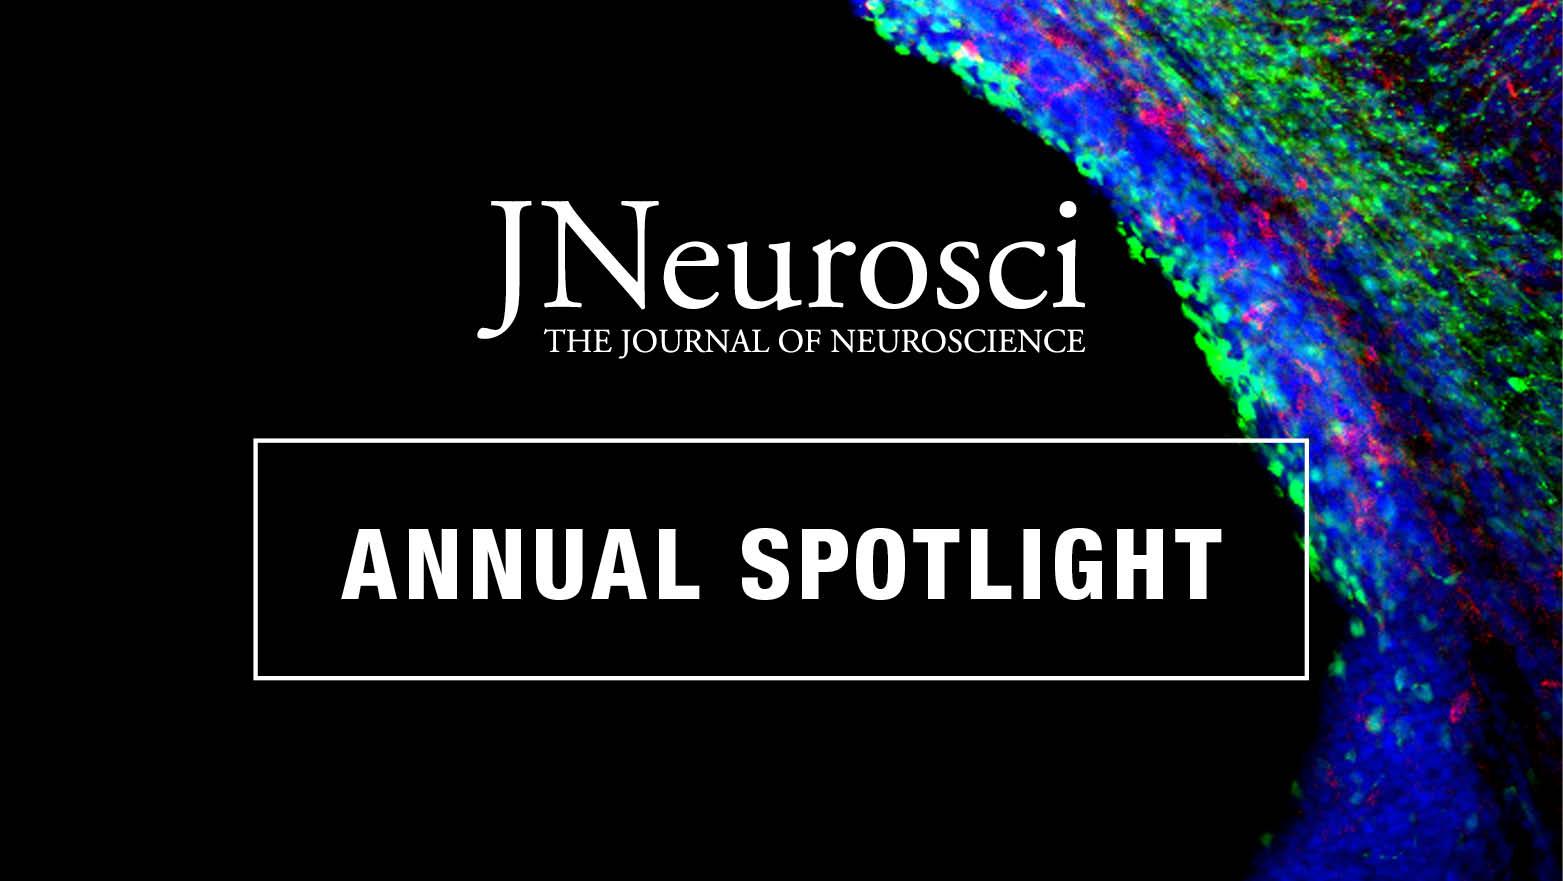 Annual Spotlight Articles